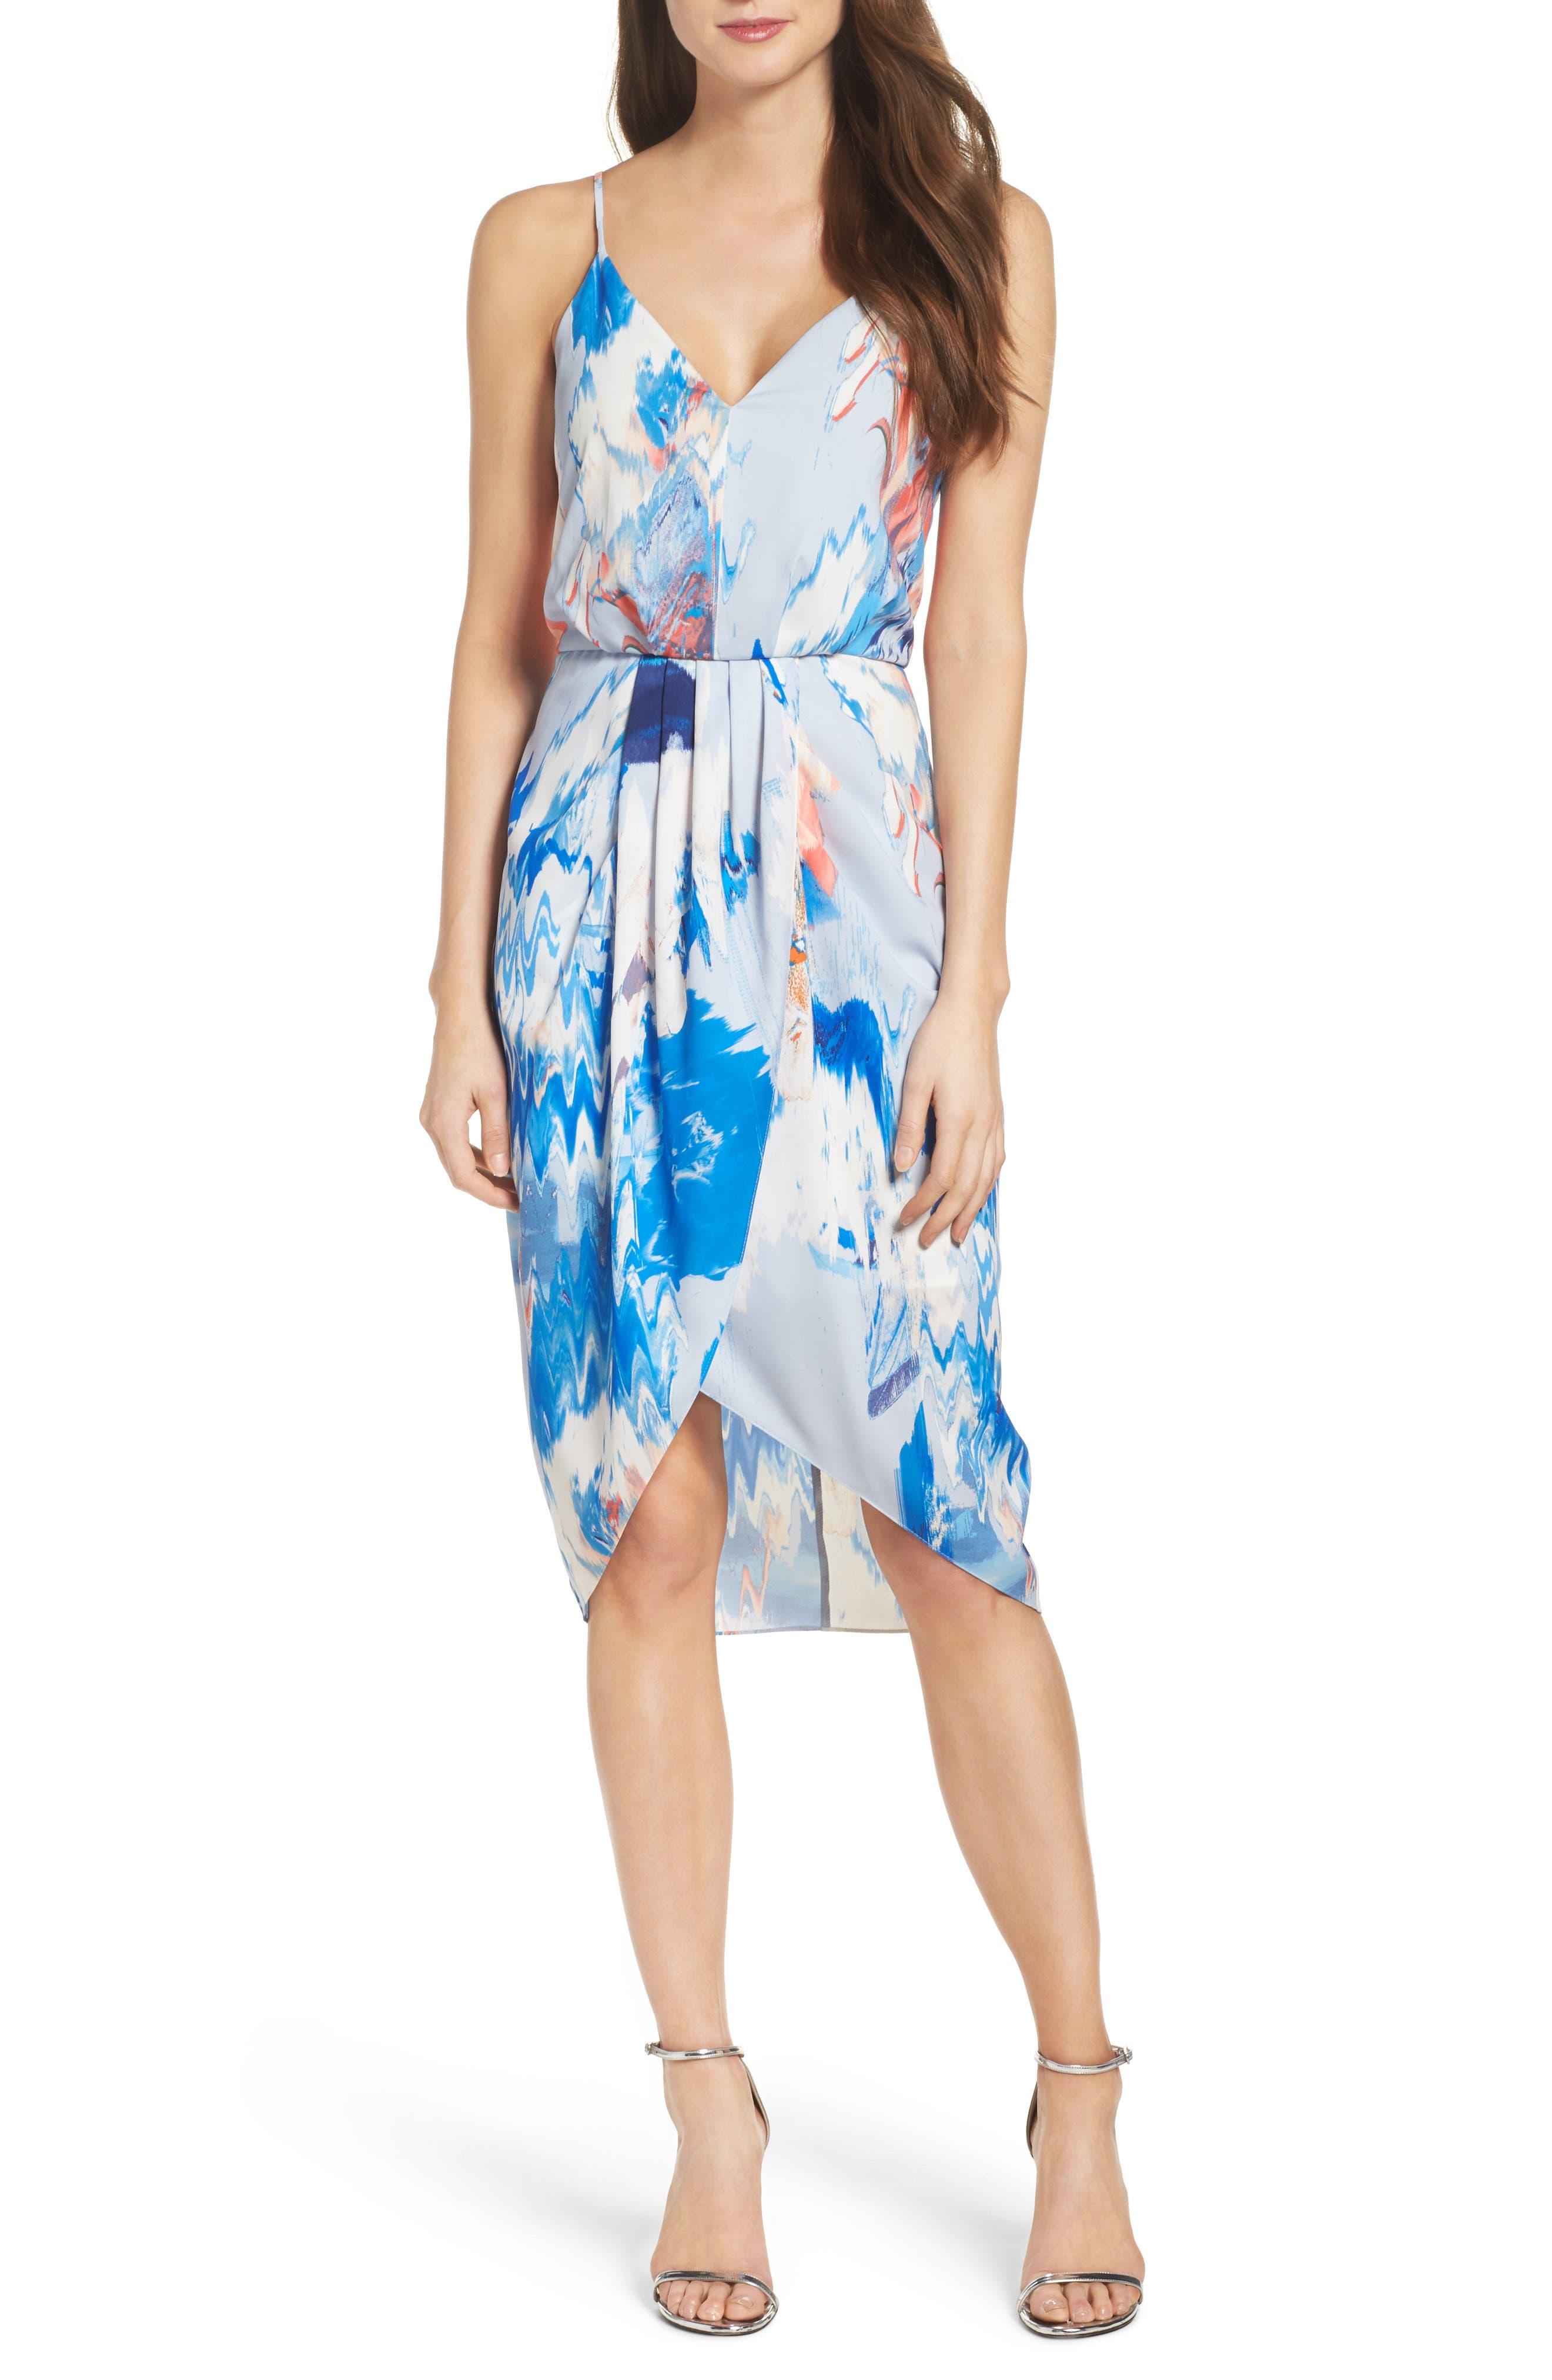 Chelsea28 Print Faux Wrap Dress, (similar to 1-1) - Blue